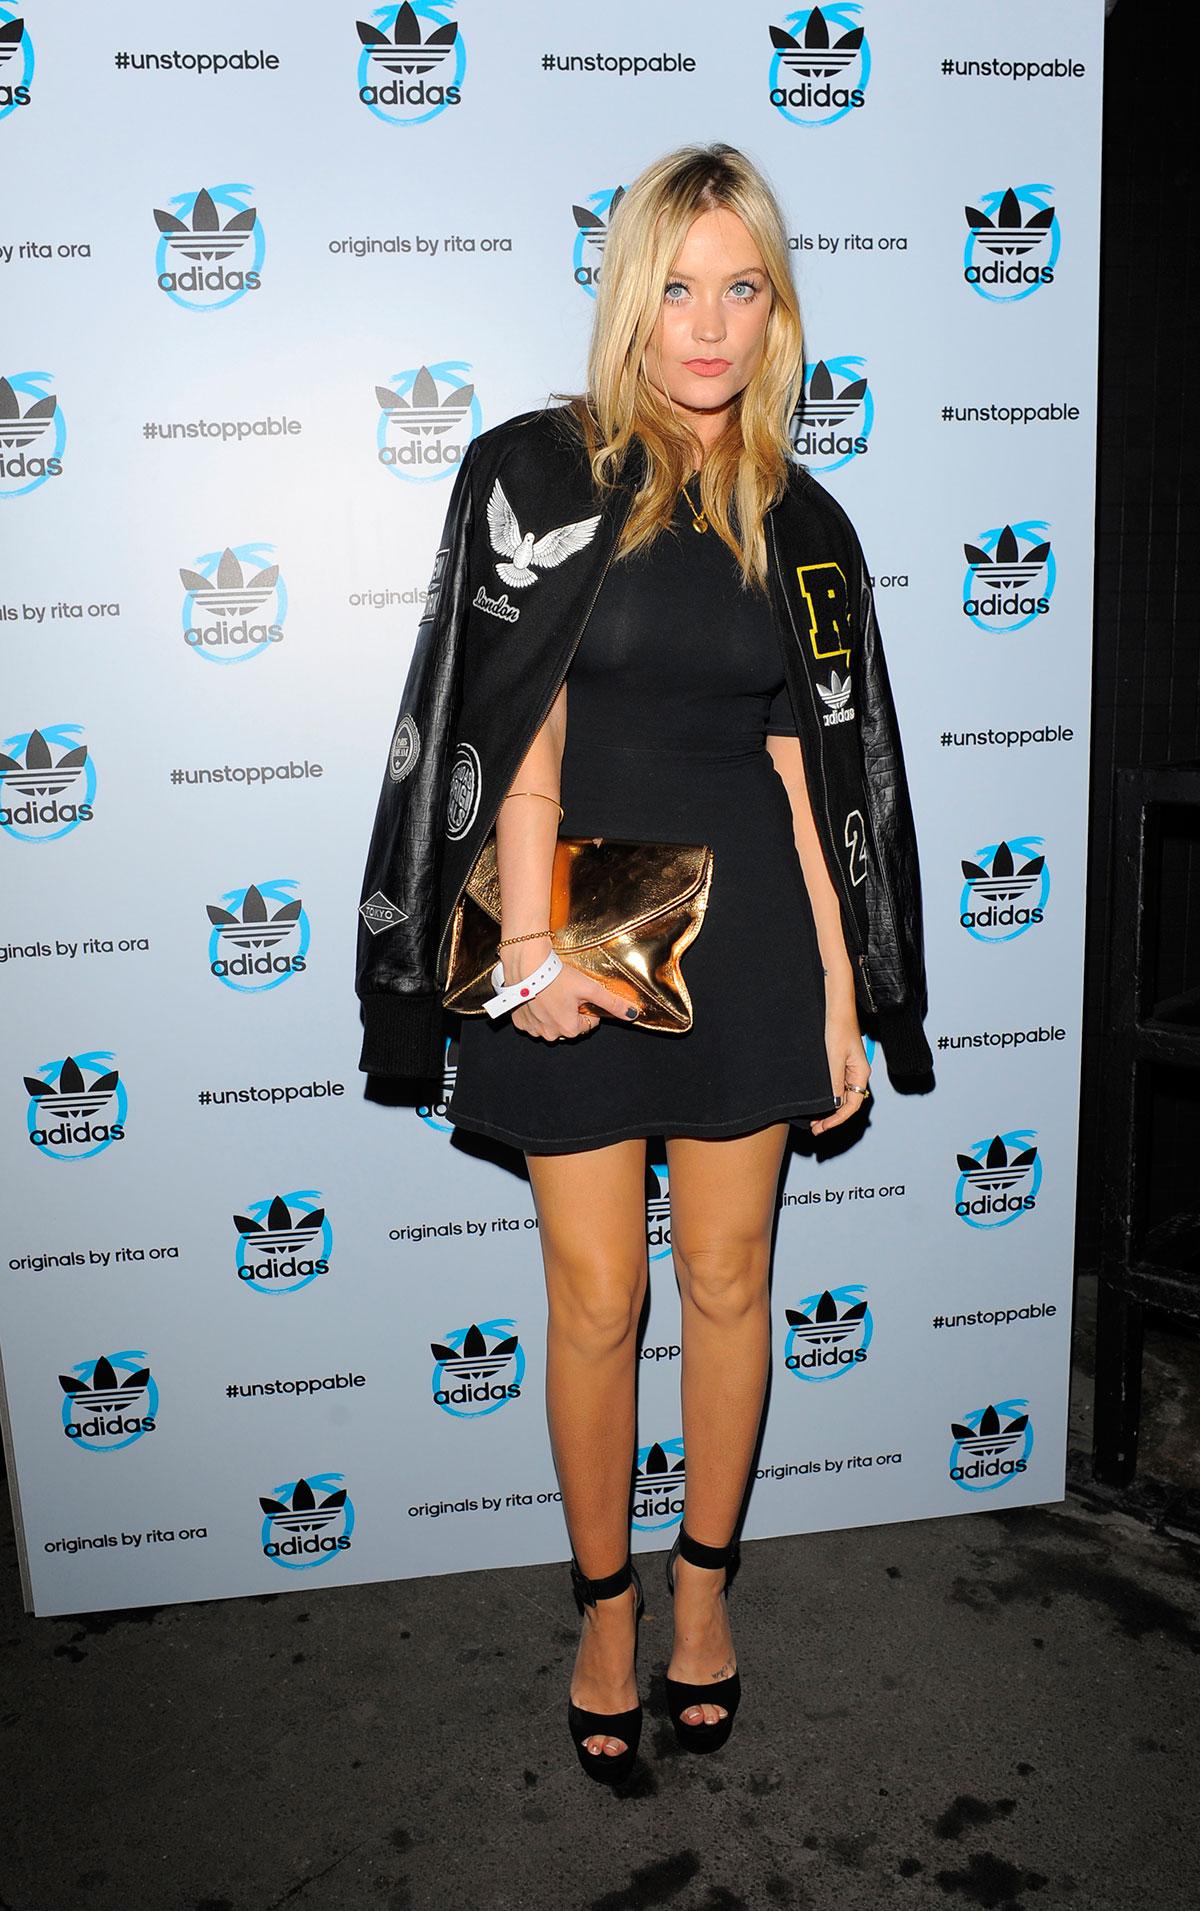 Laura Whitmore attends adidas originals by Rita Ora launch